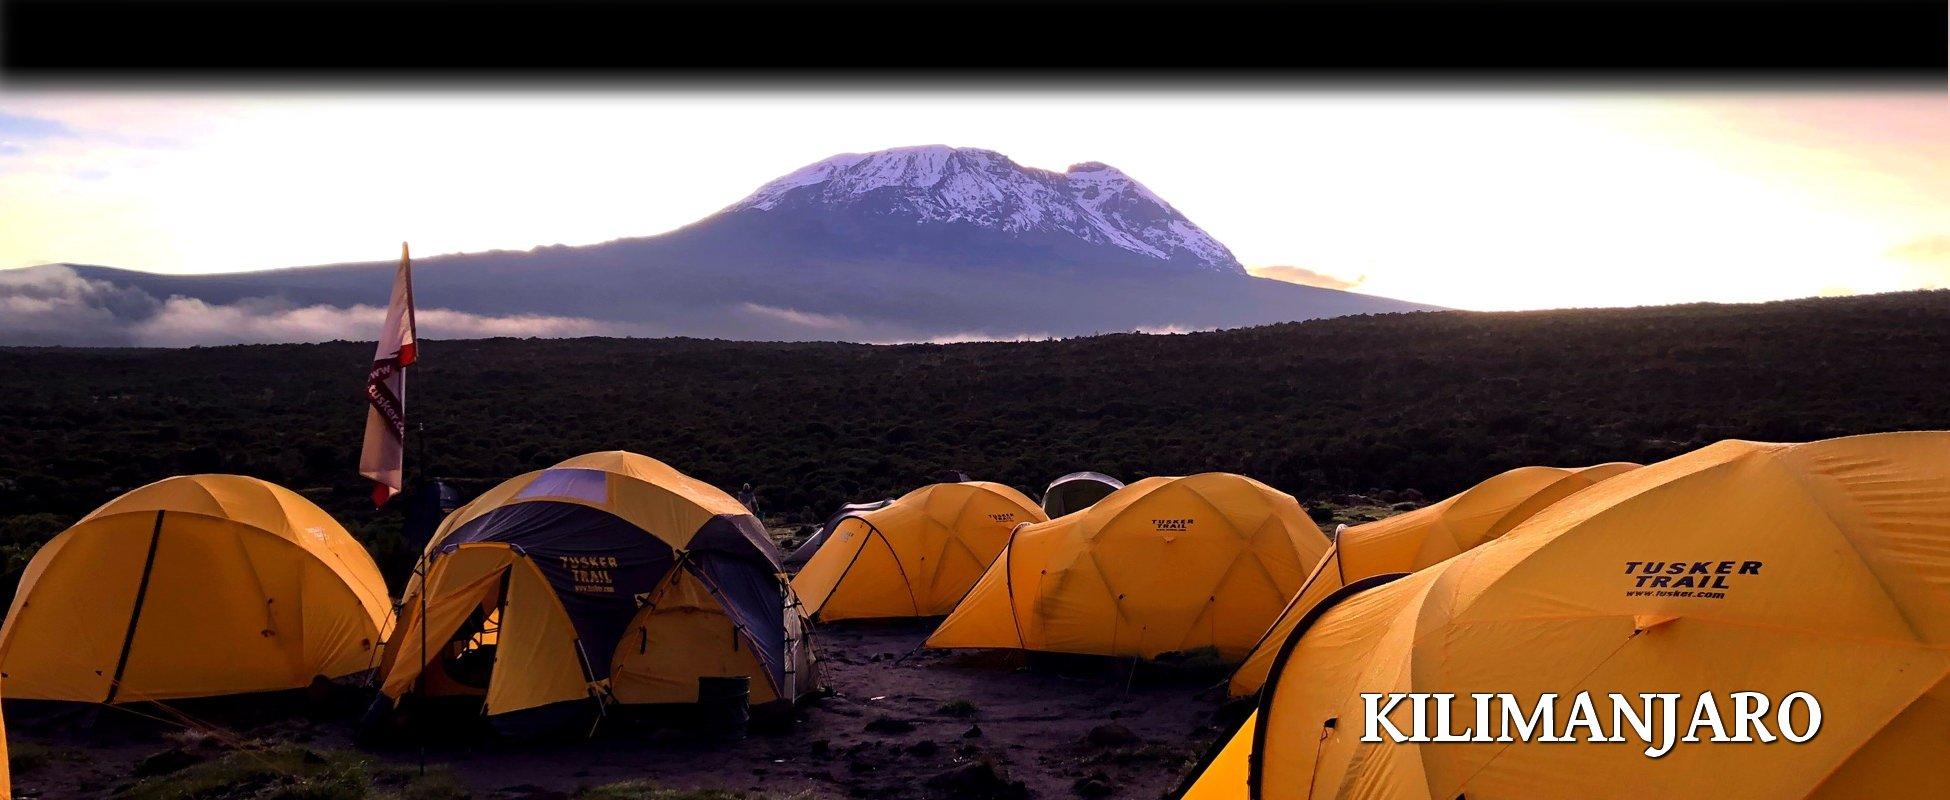 Kilimanjaro Mountain Camp